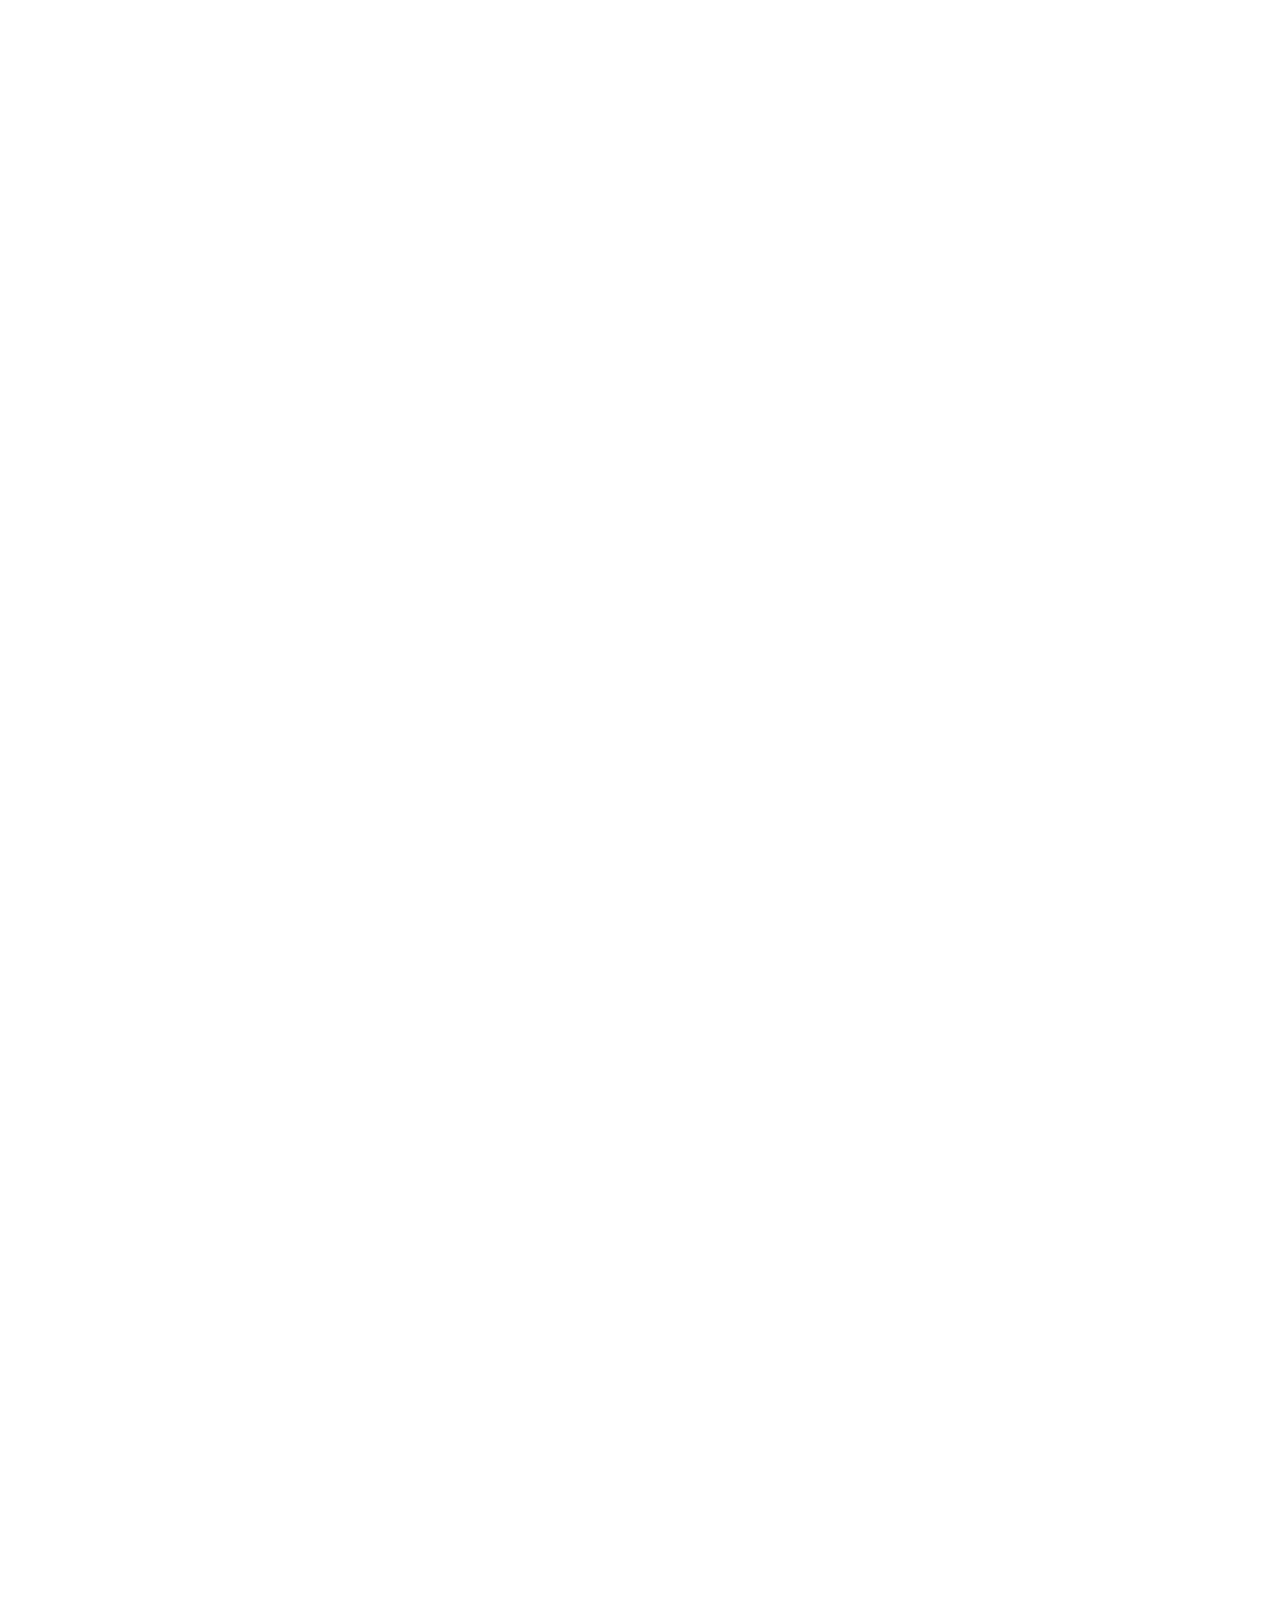 CHLOE Standard Profile Arch Top Full Lite Decorative Glass Double Iron Door – CHLOE OID-6080-CHLAT